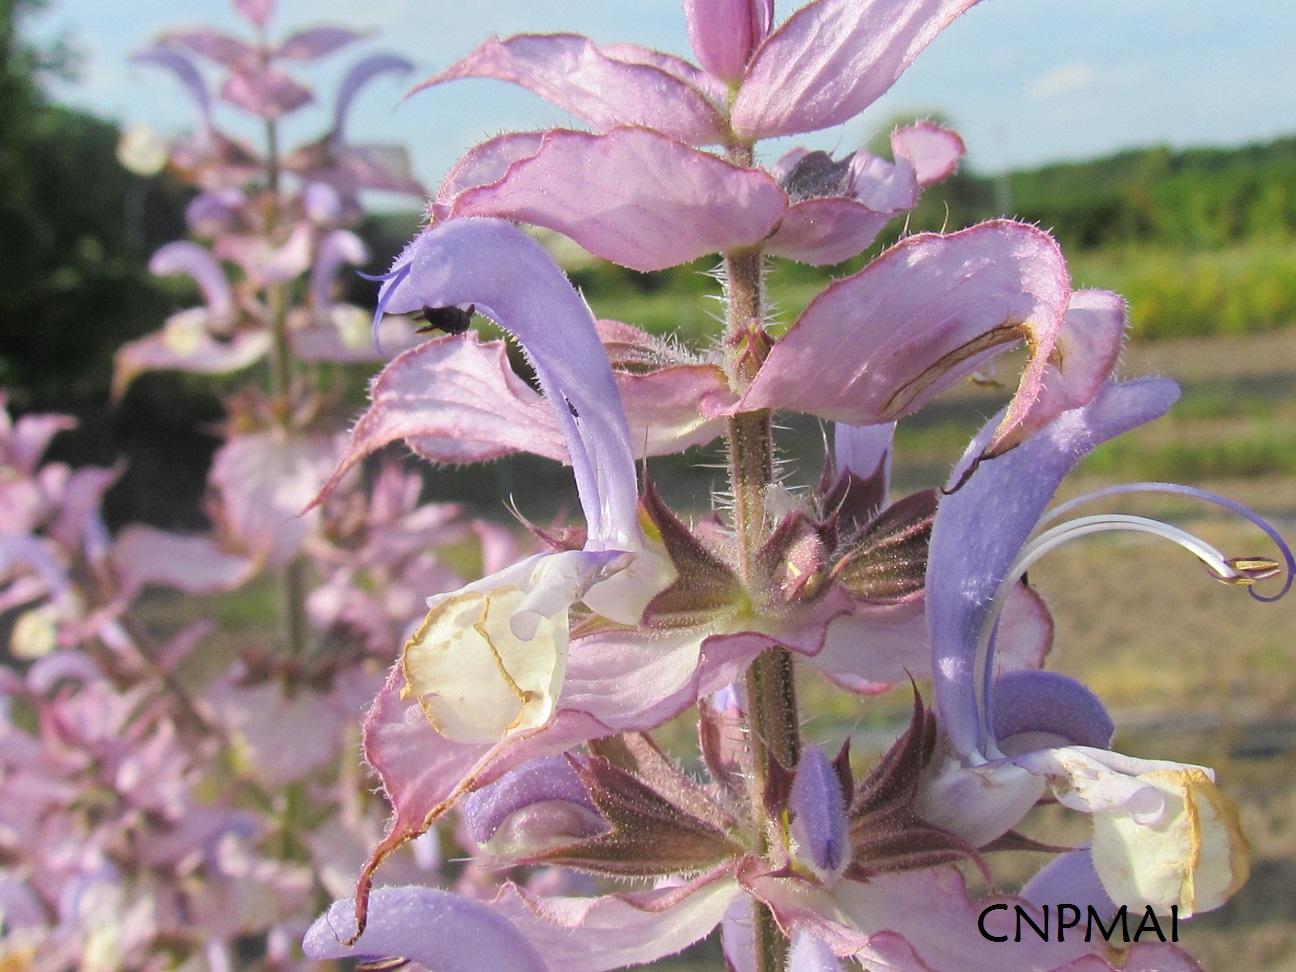 Salvia sclarea, P168, CNPMAI, 13 6 15 ; B PASQUIER (31) 30p